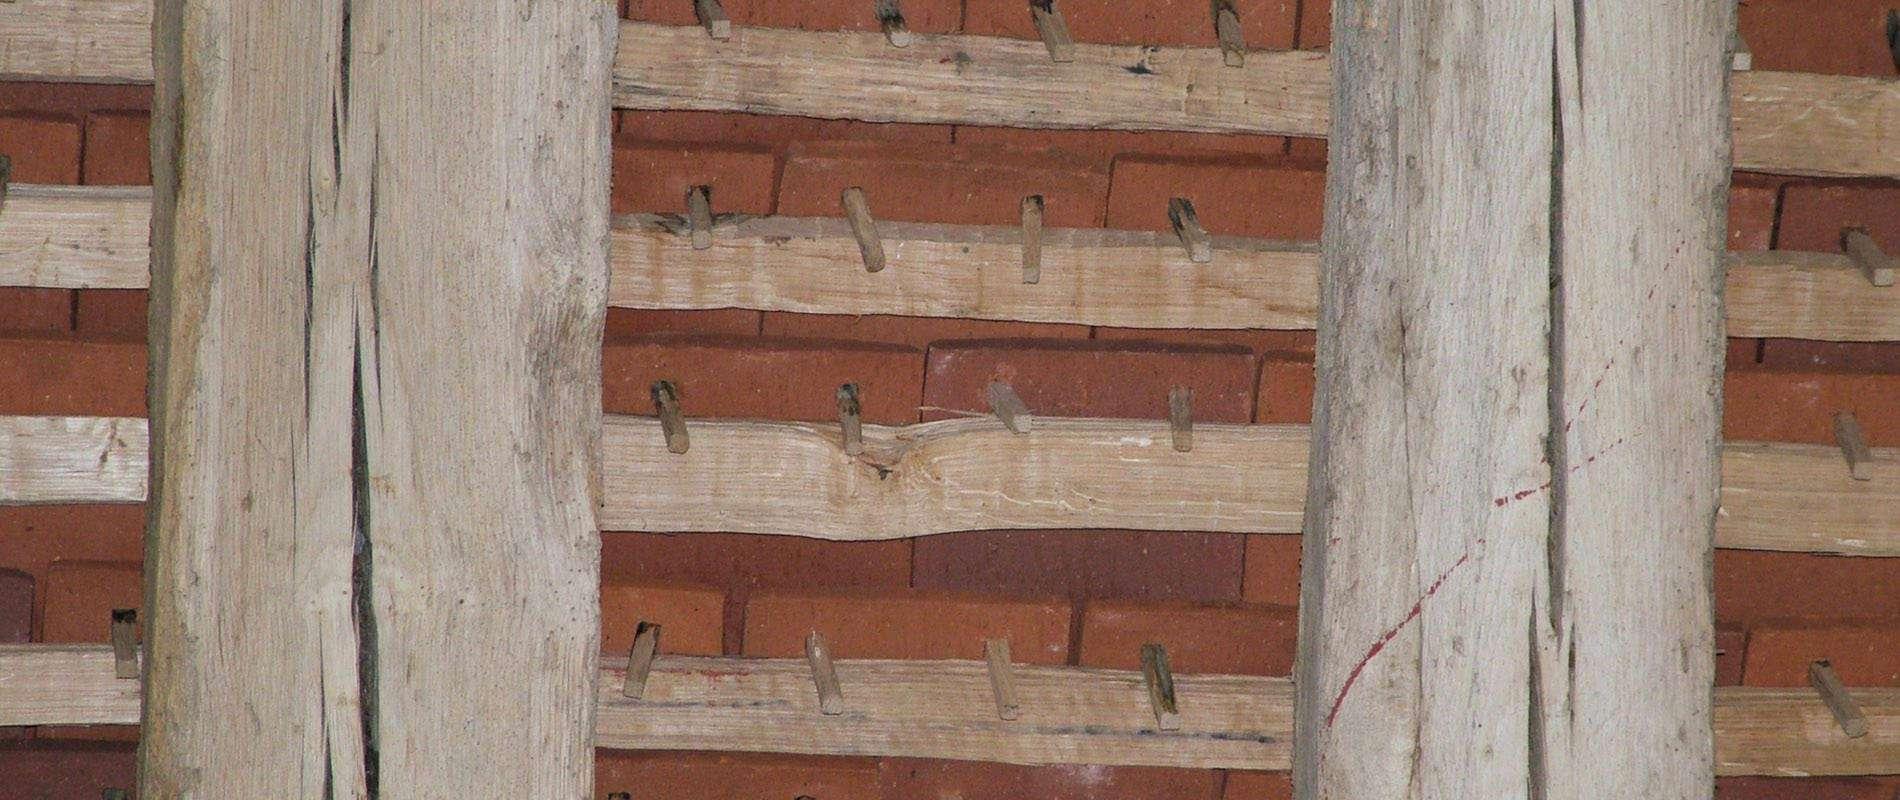 tudor clay roof tiles slide 4